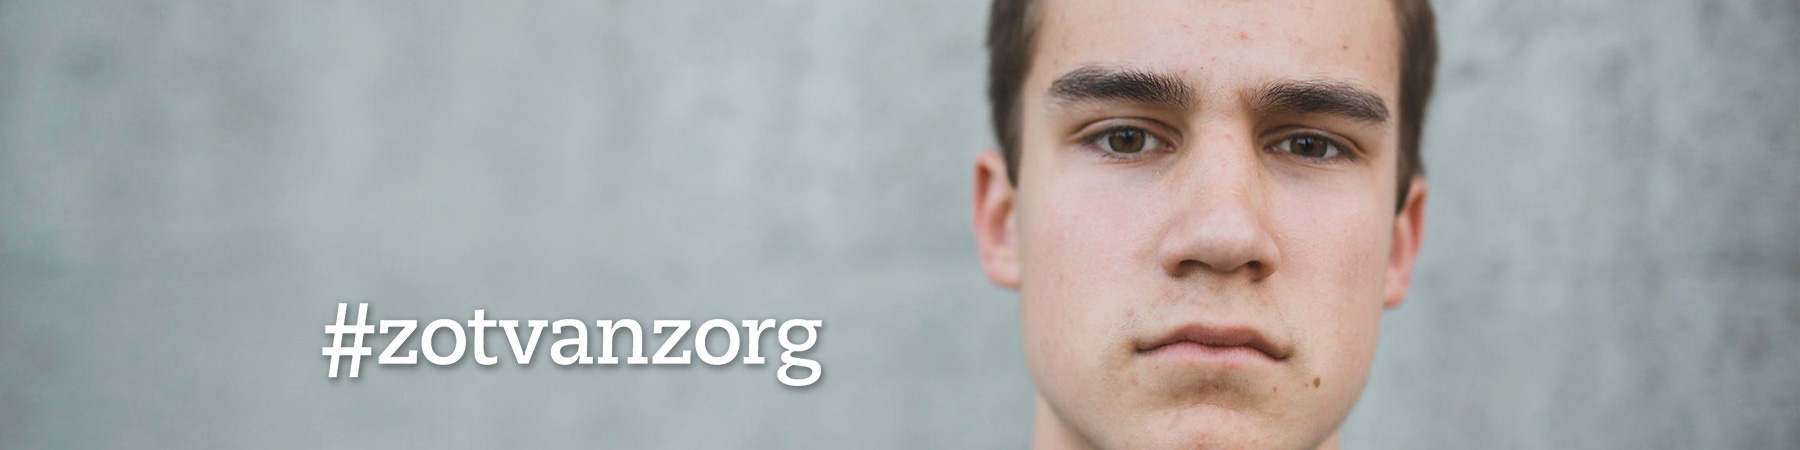 zotvanzorg_website_3_5.jpg